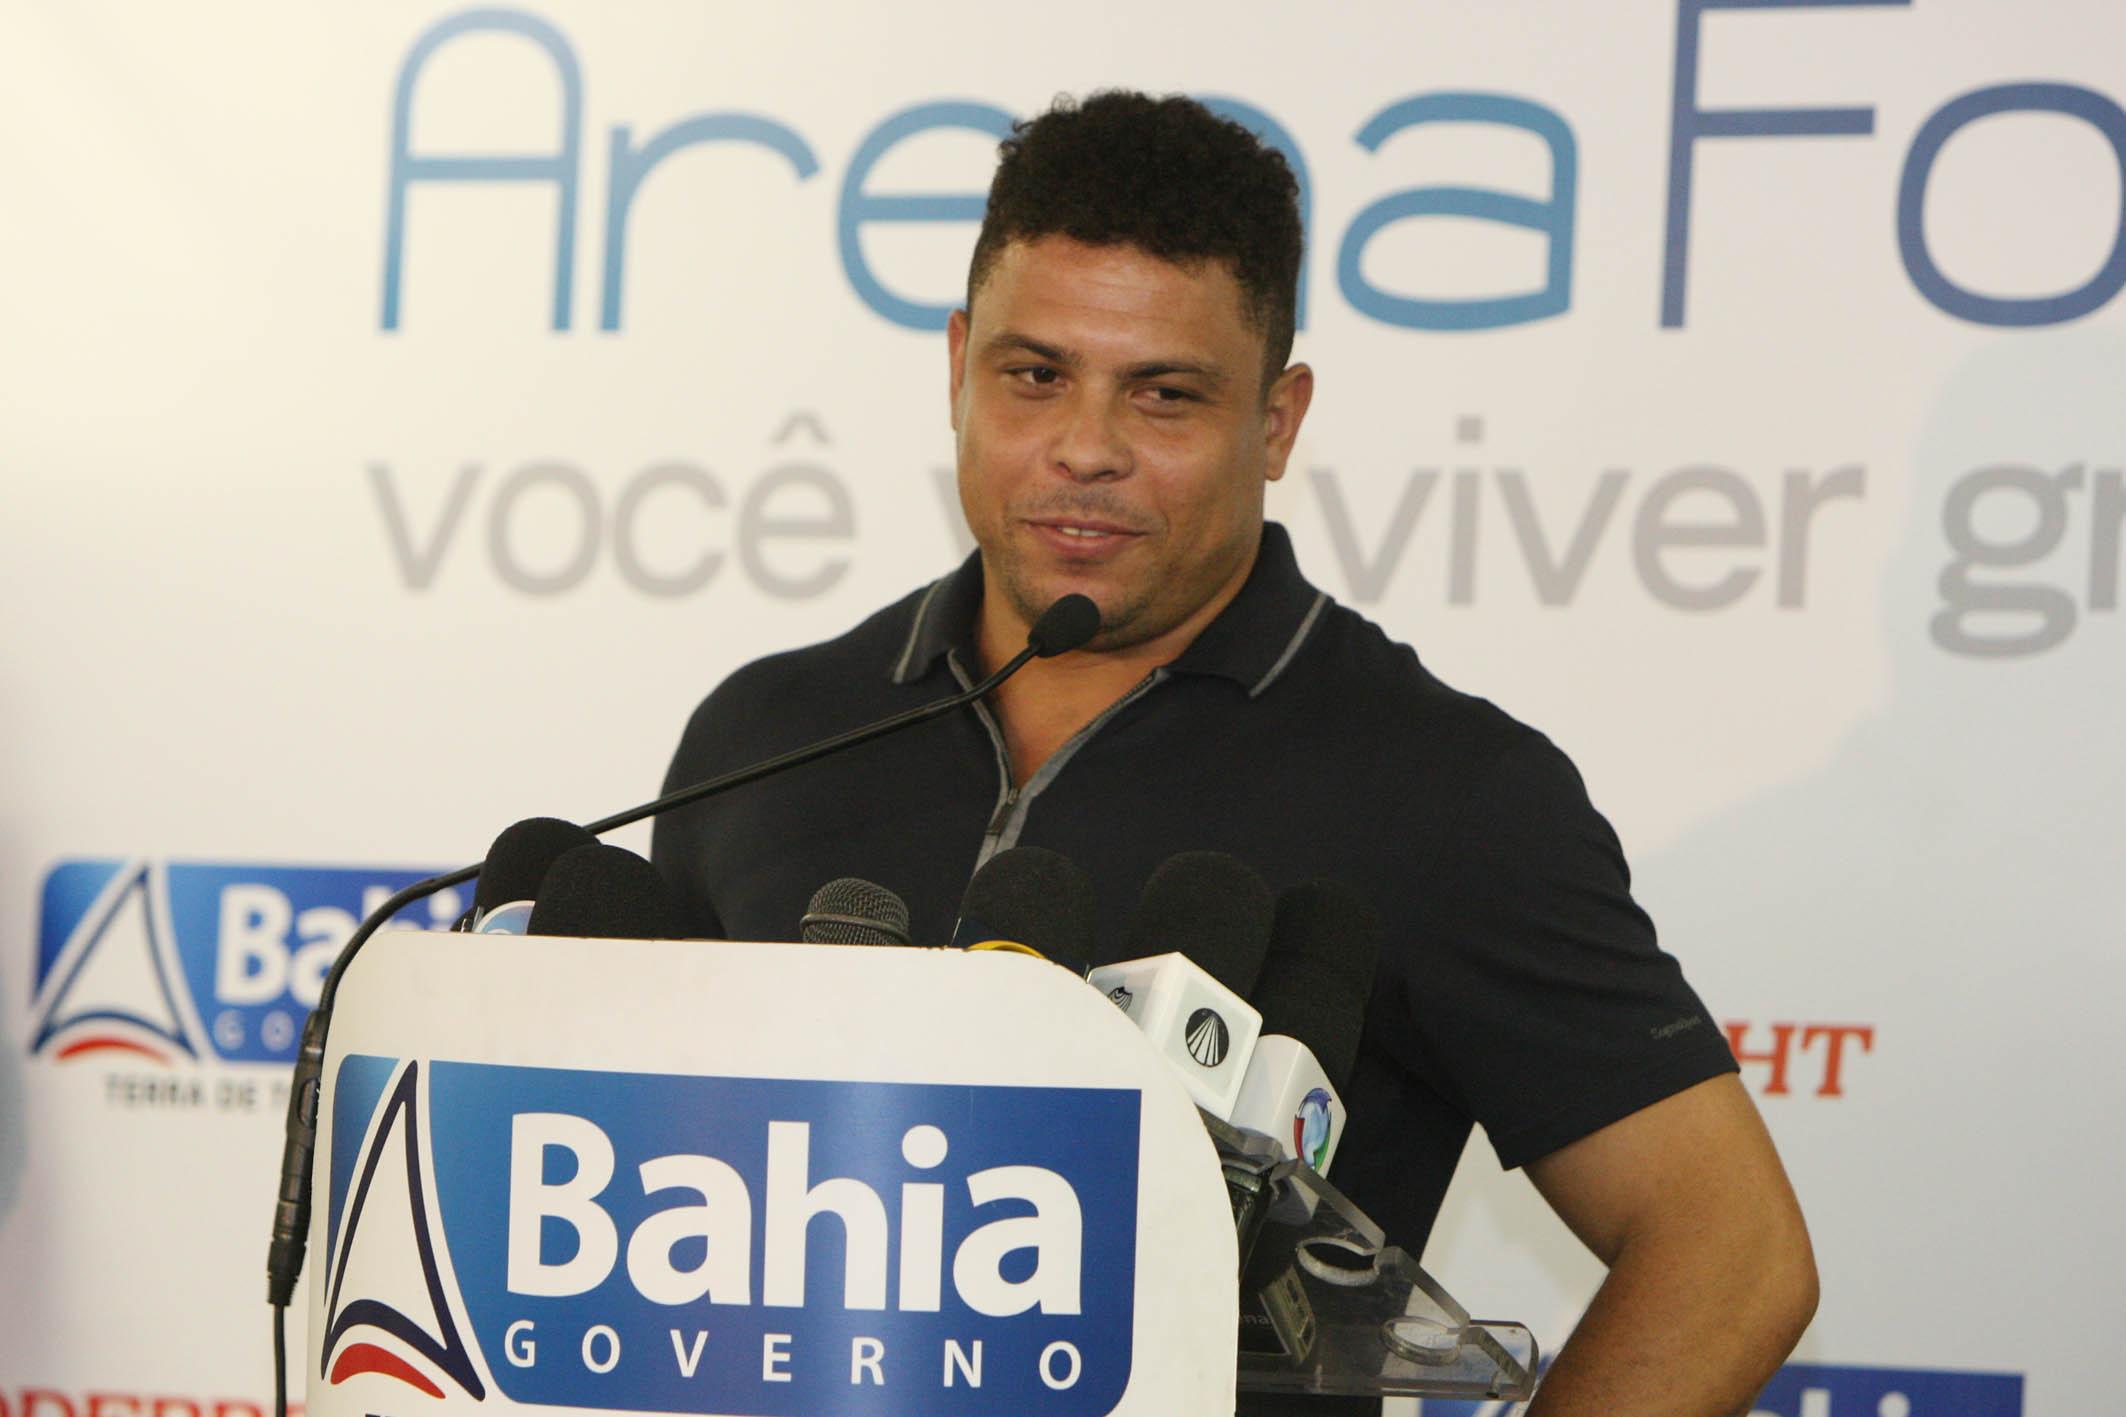 ronaldo biography association football player brazil